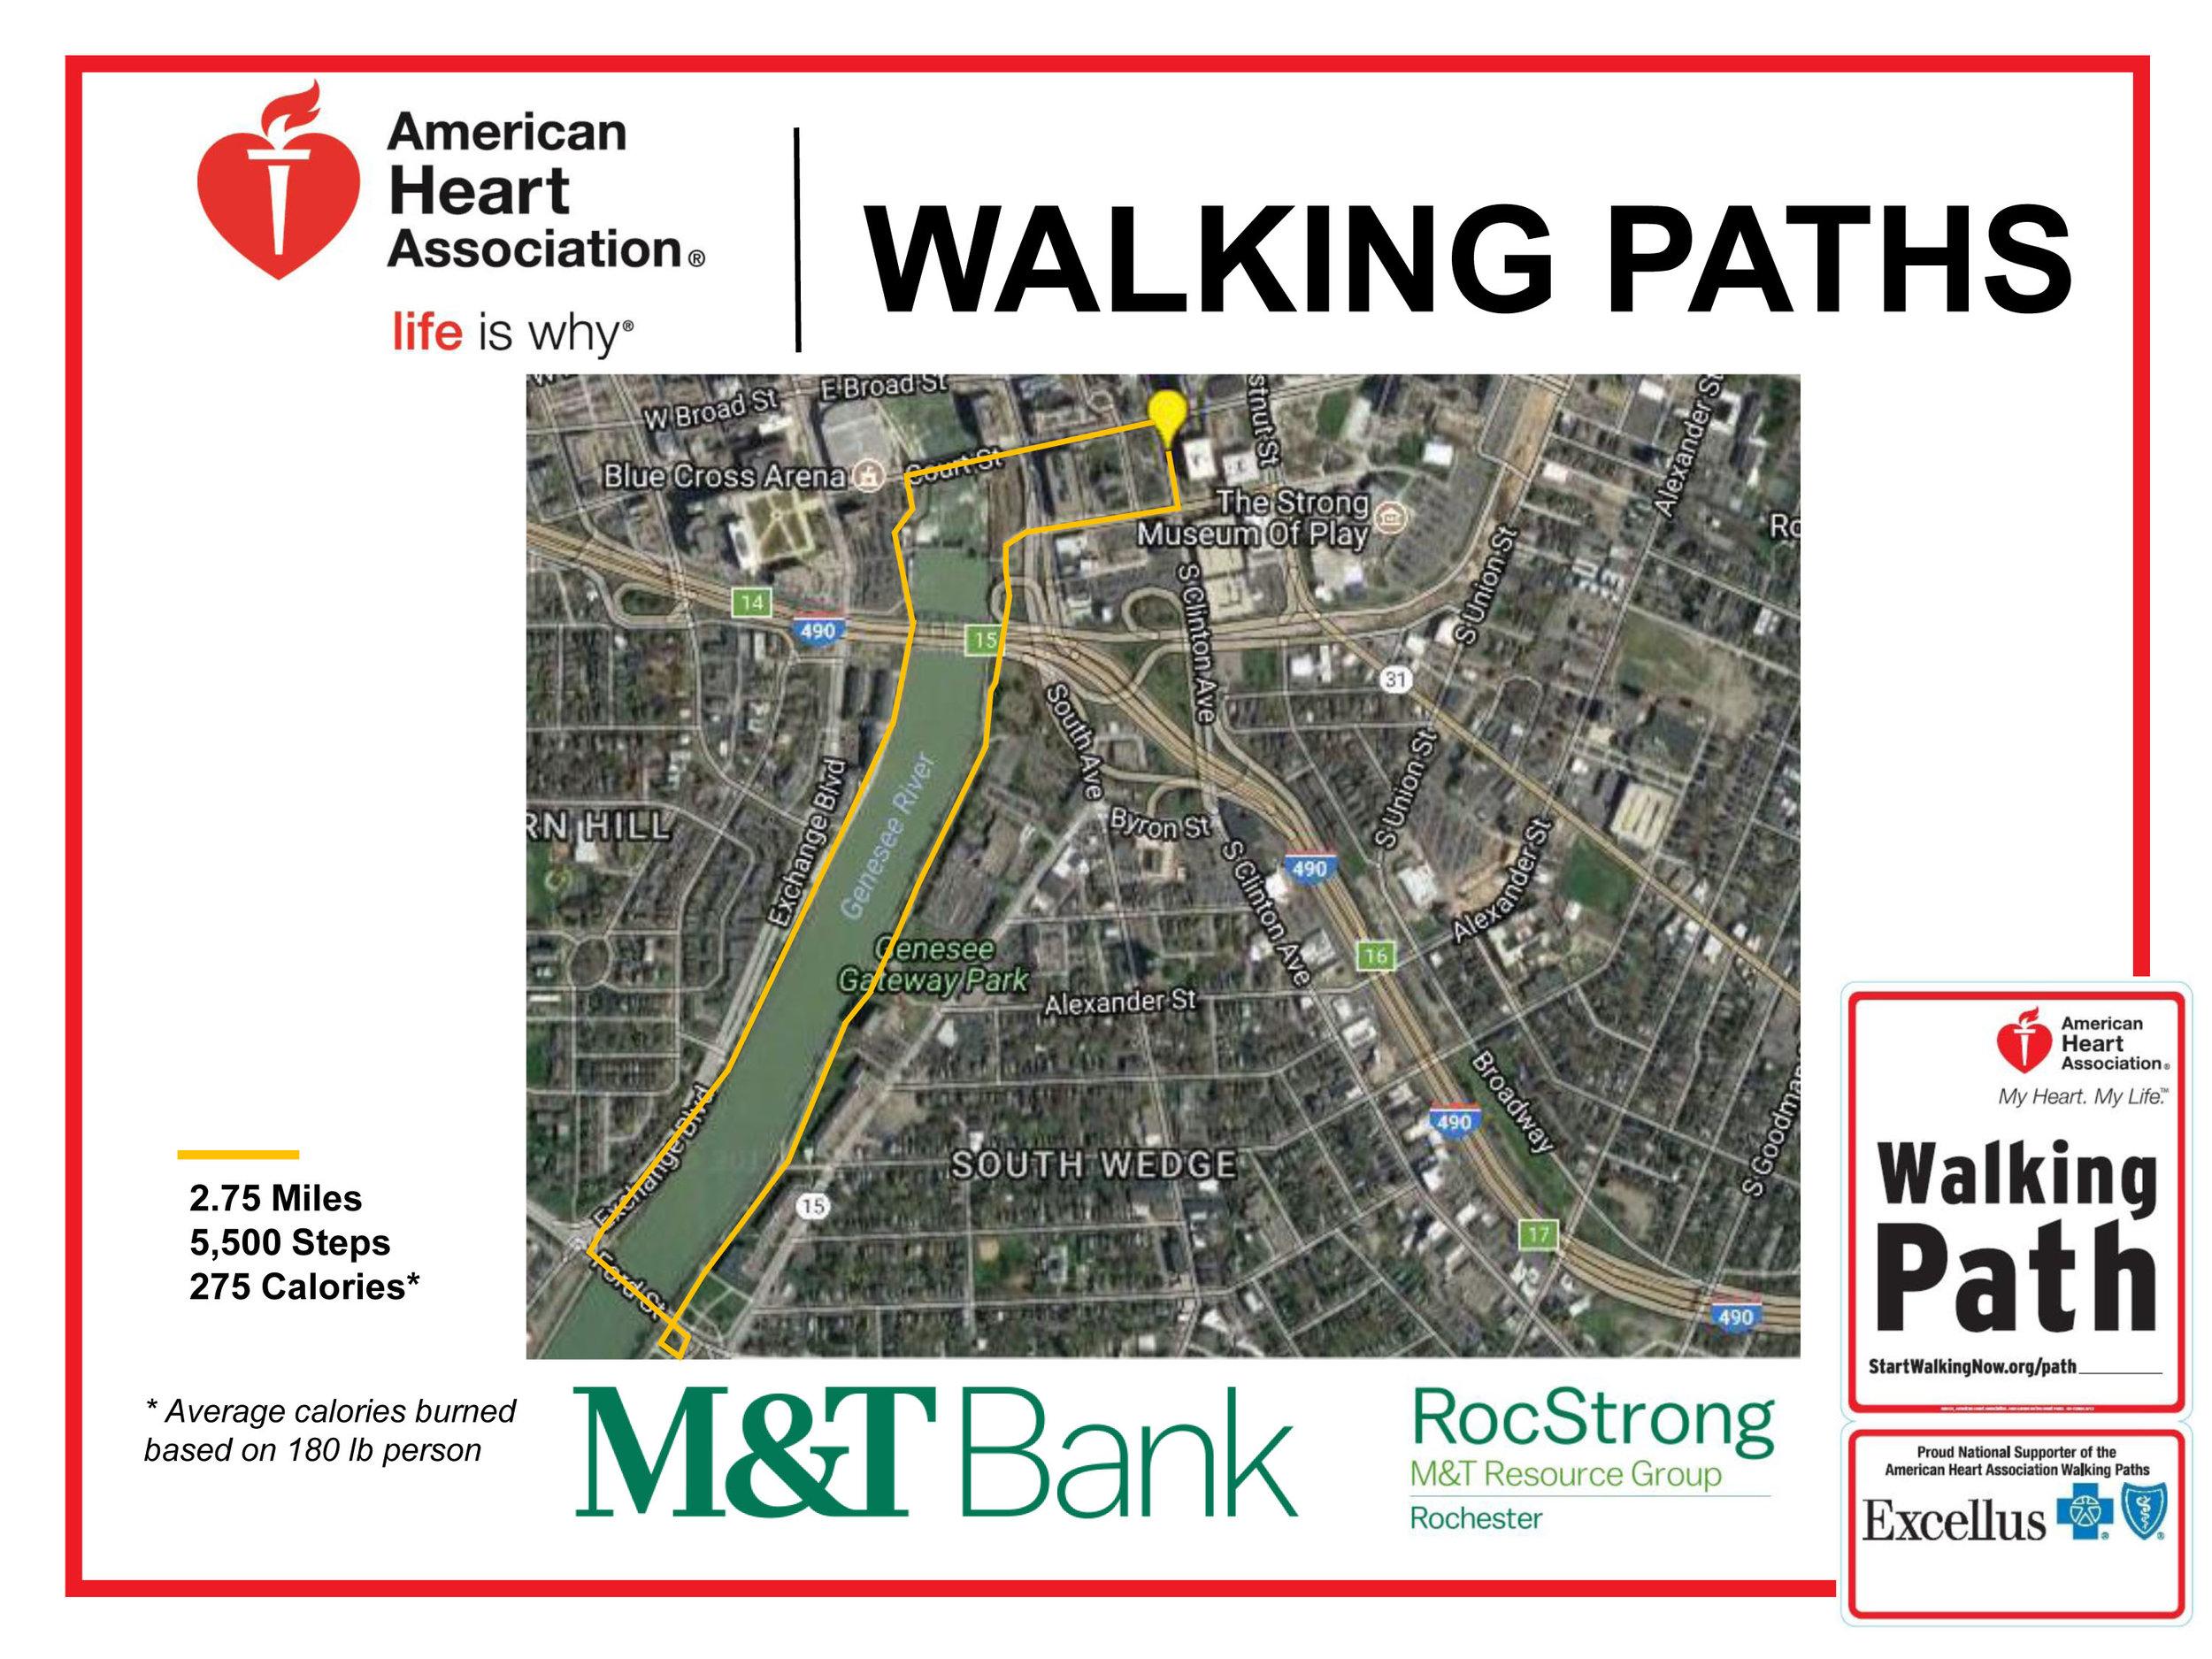 Washington Square Park Neighborhood Walking Path 2.jpg